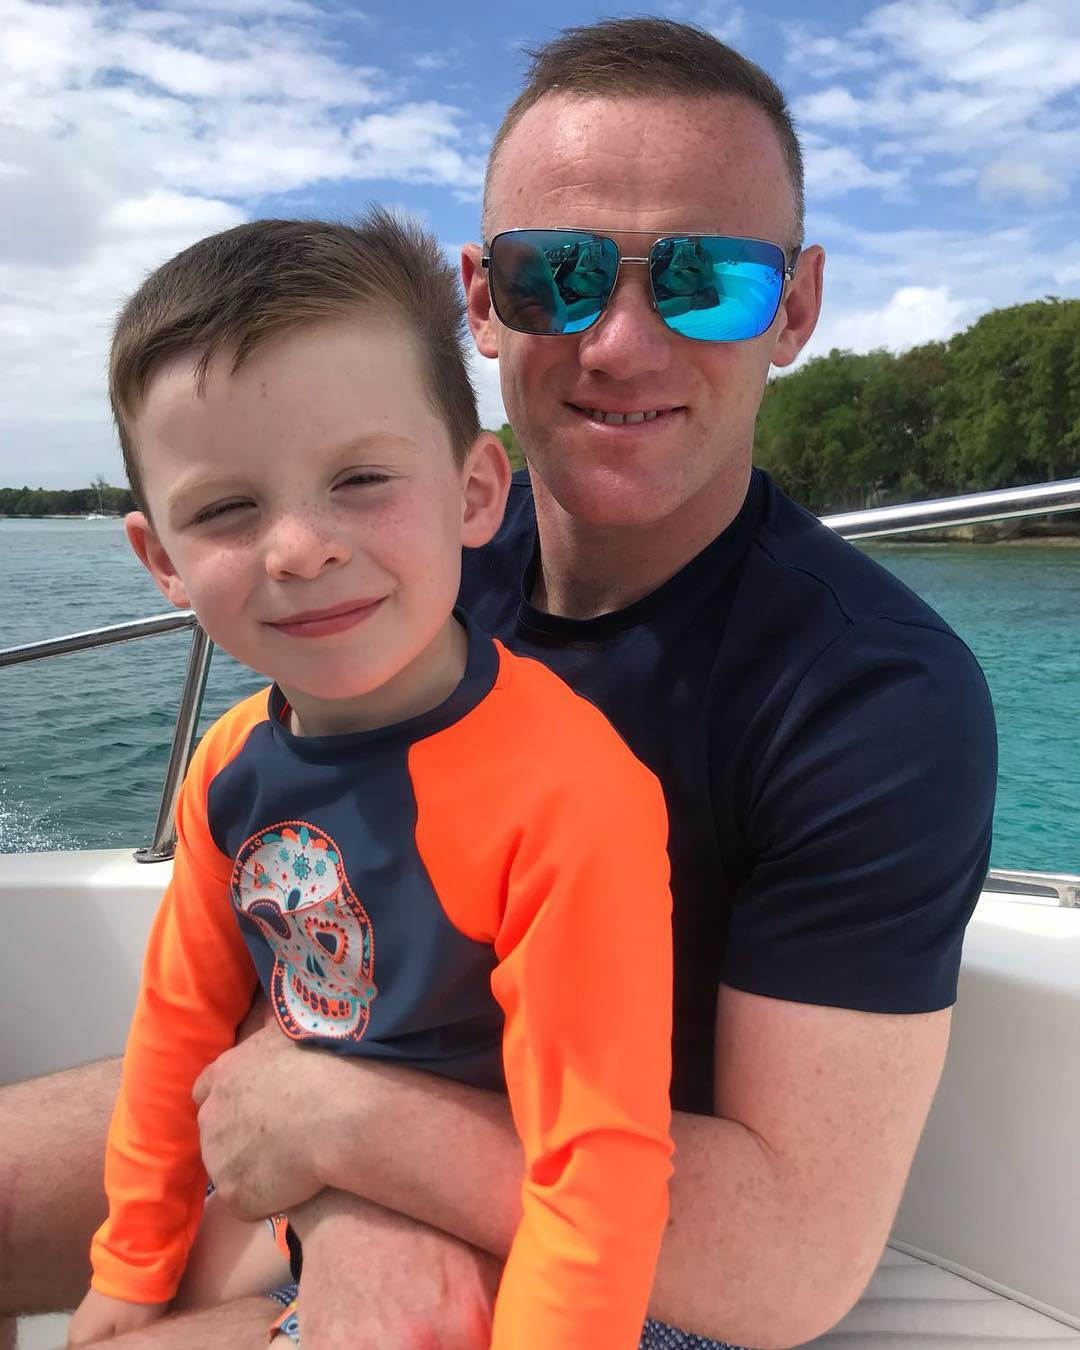 Wayne Rooney Family (Instagram)